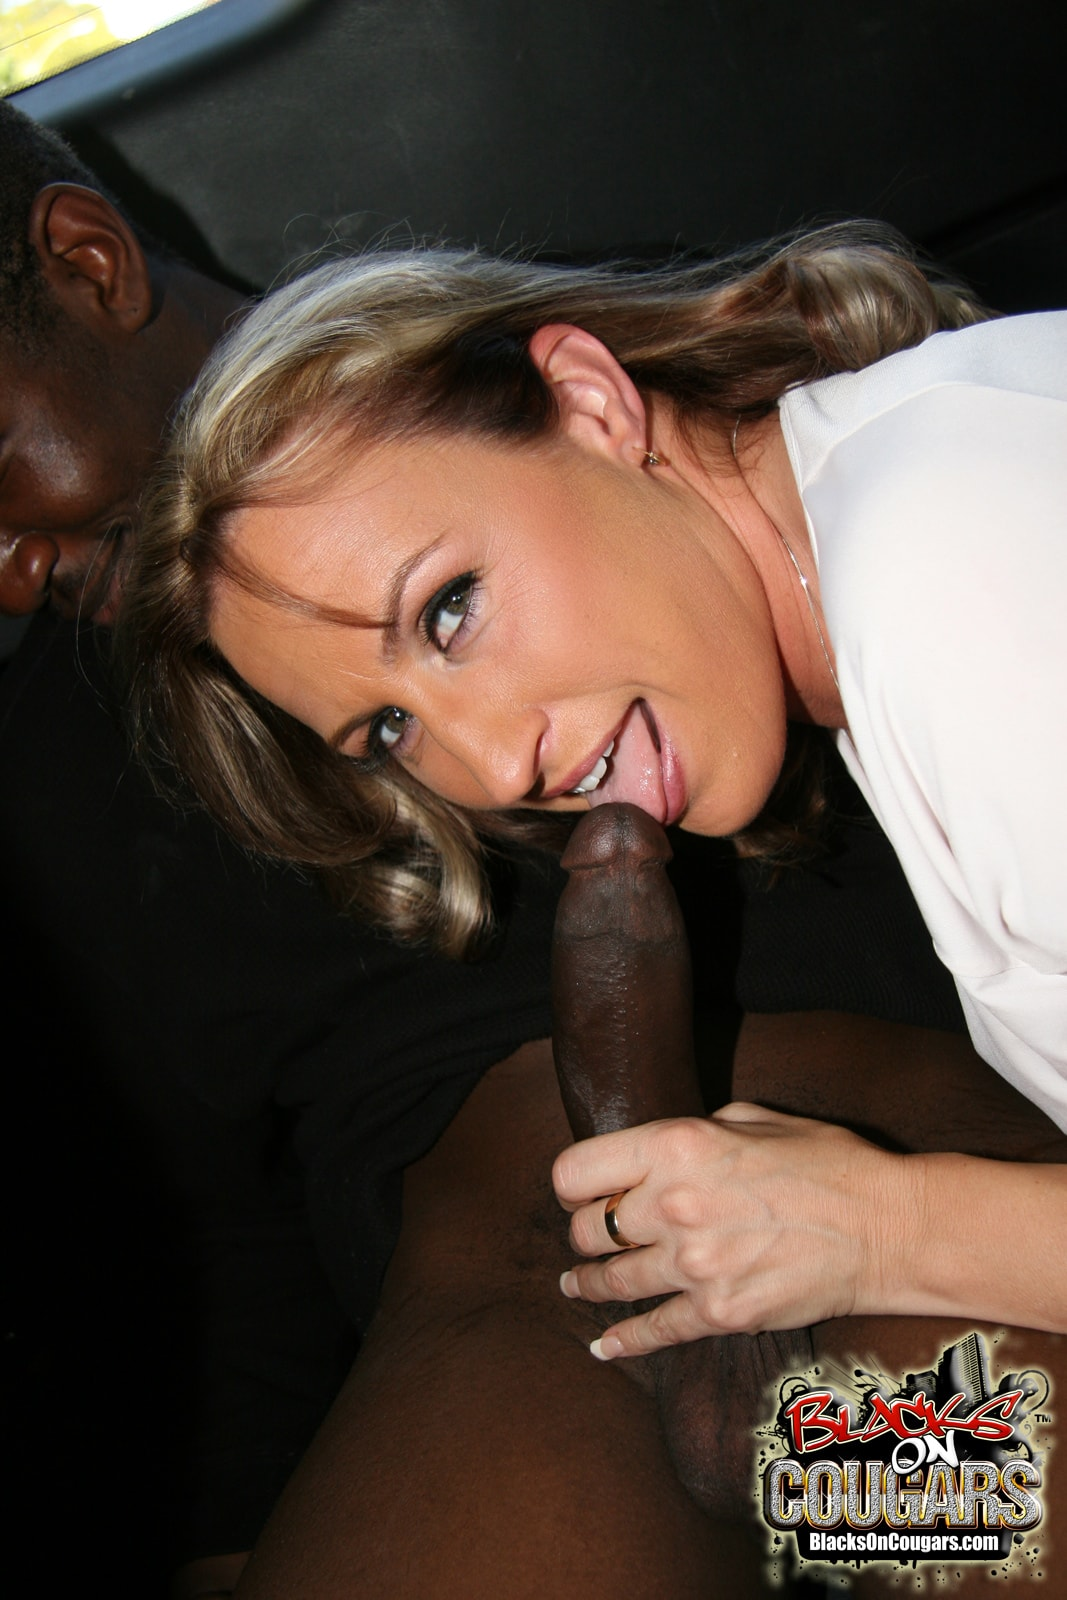 Dogfart '- Blacks On Cougars' starring Joey Lynn (Photo 5)